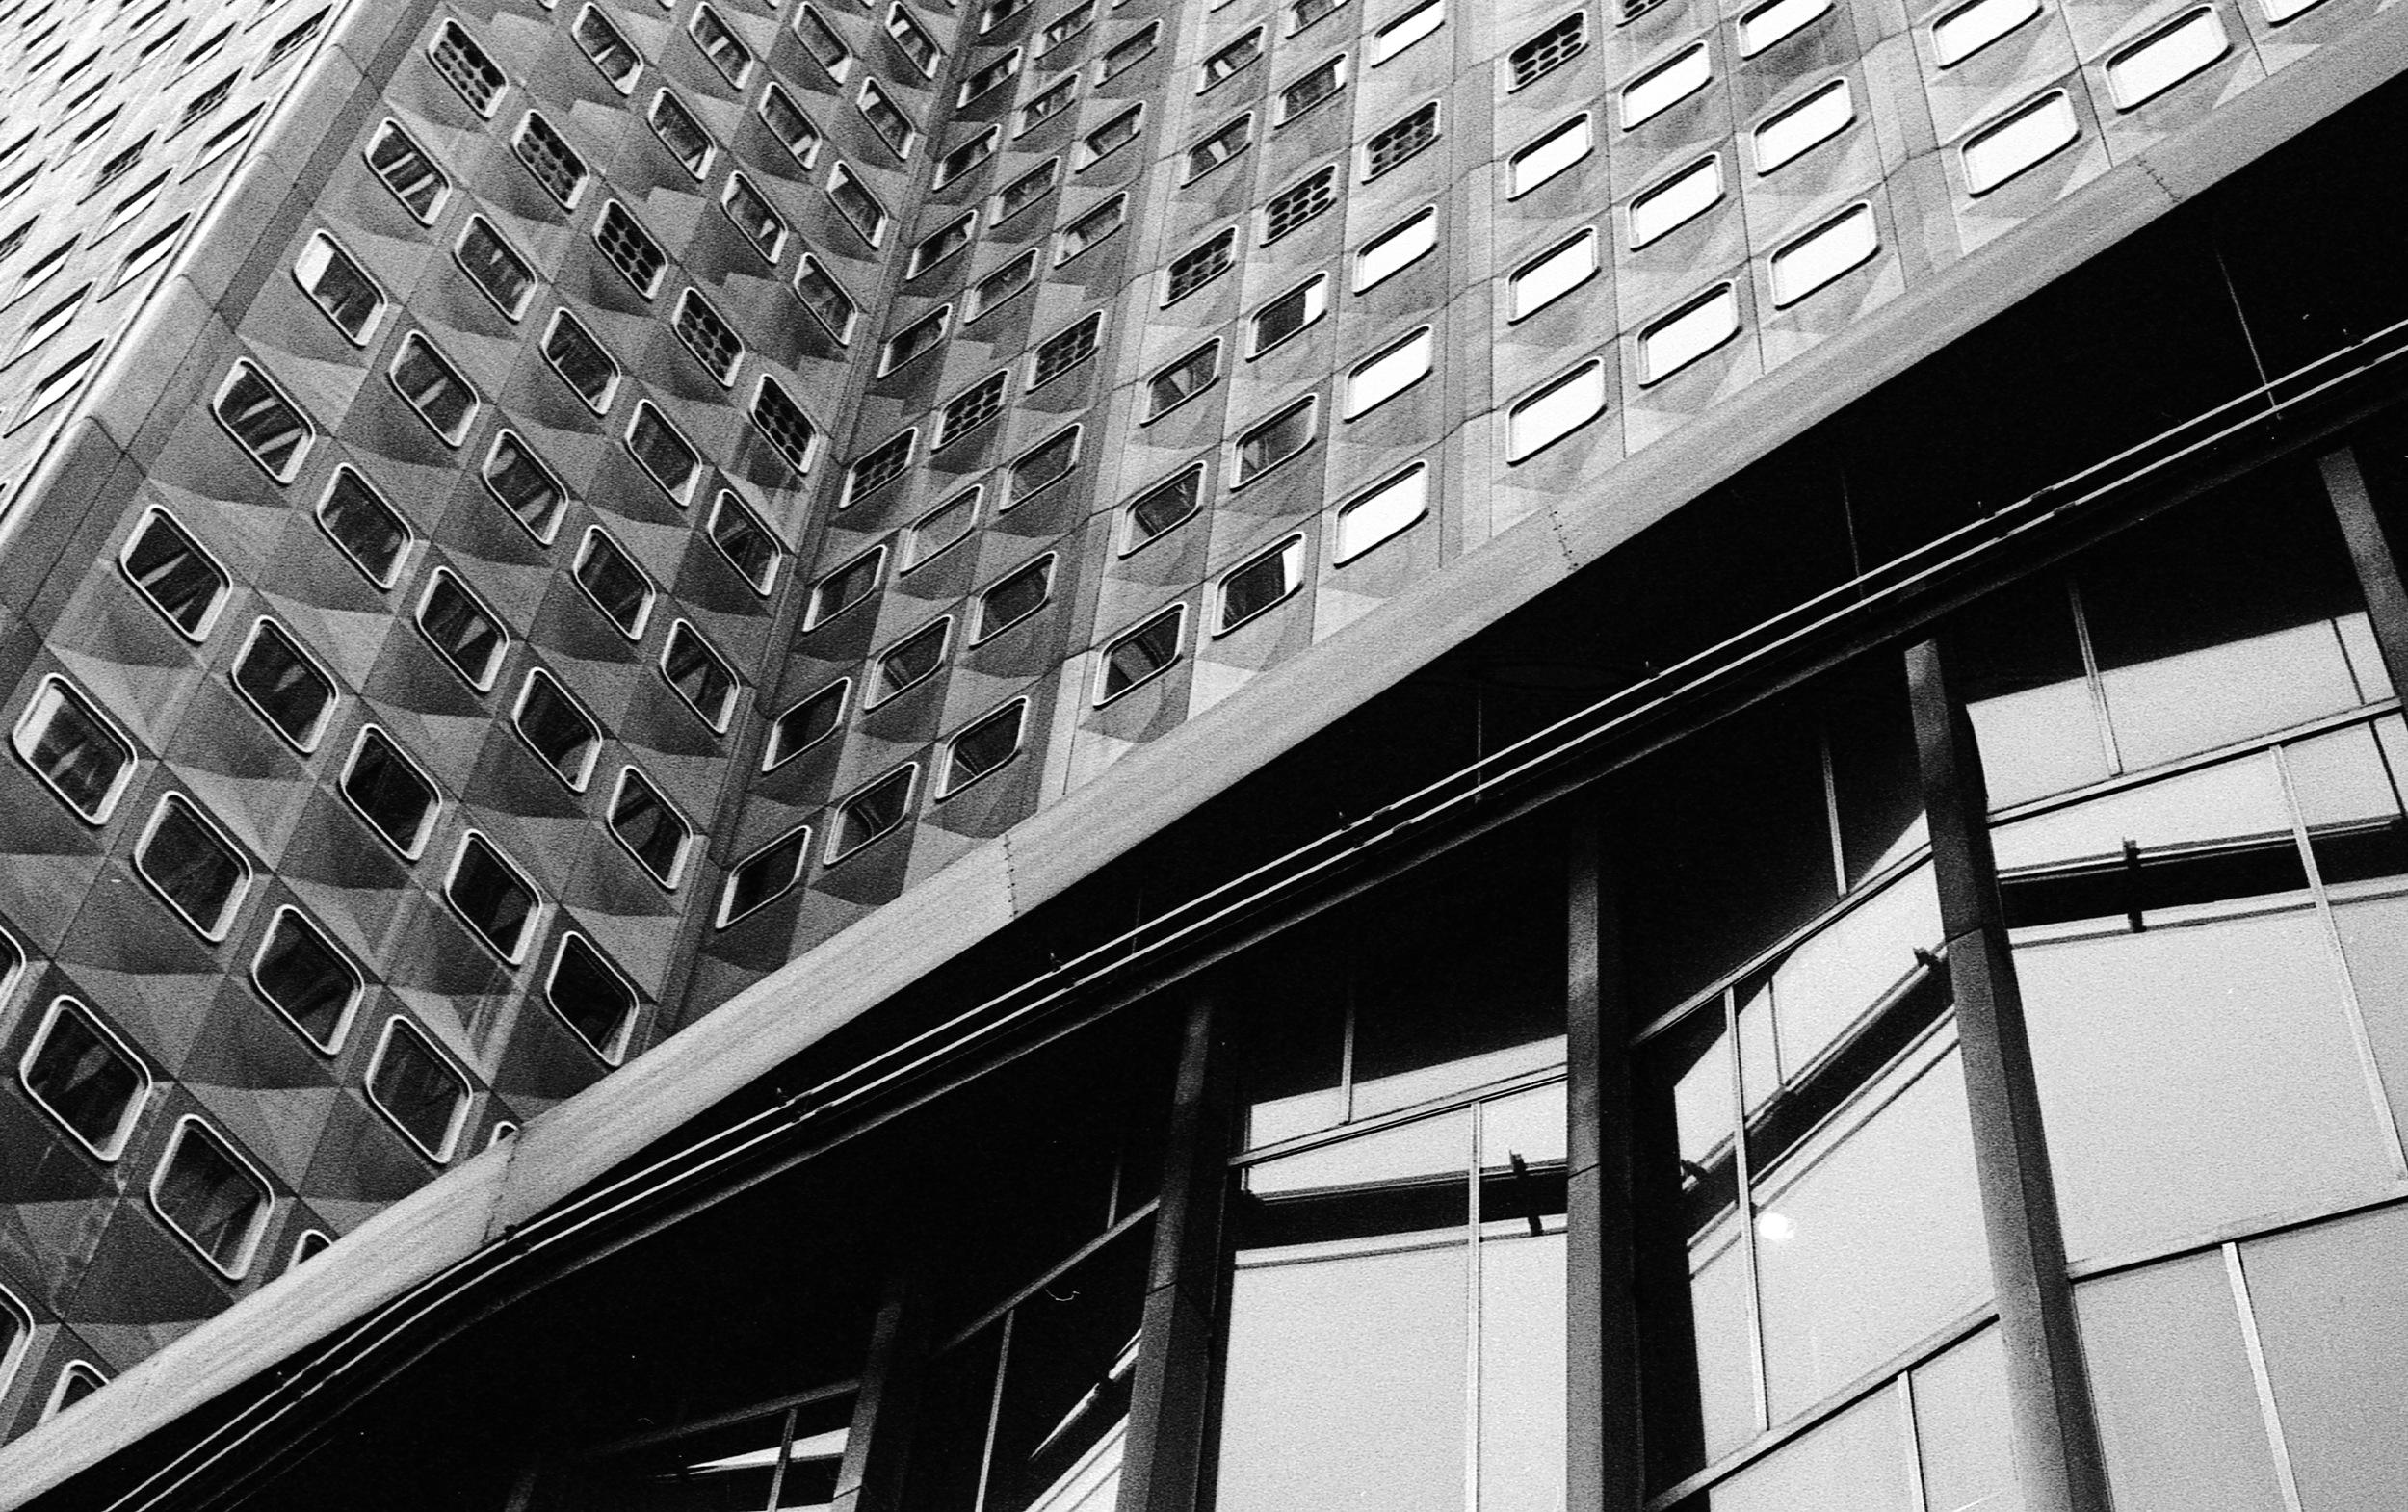 A lobby emerges - Pittsburgh (Alcoa Building) | Tri-X 400 @ 1600